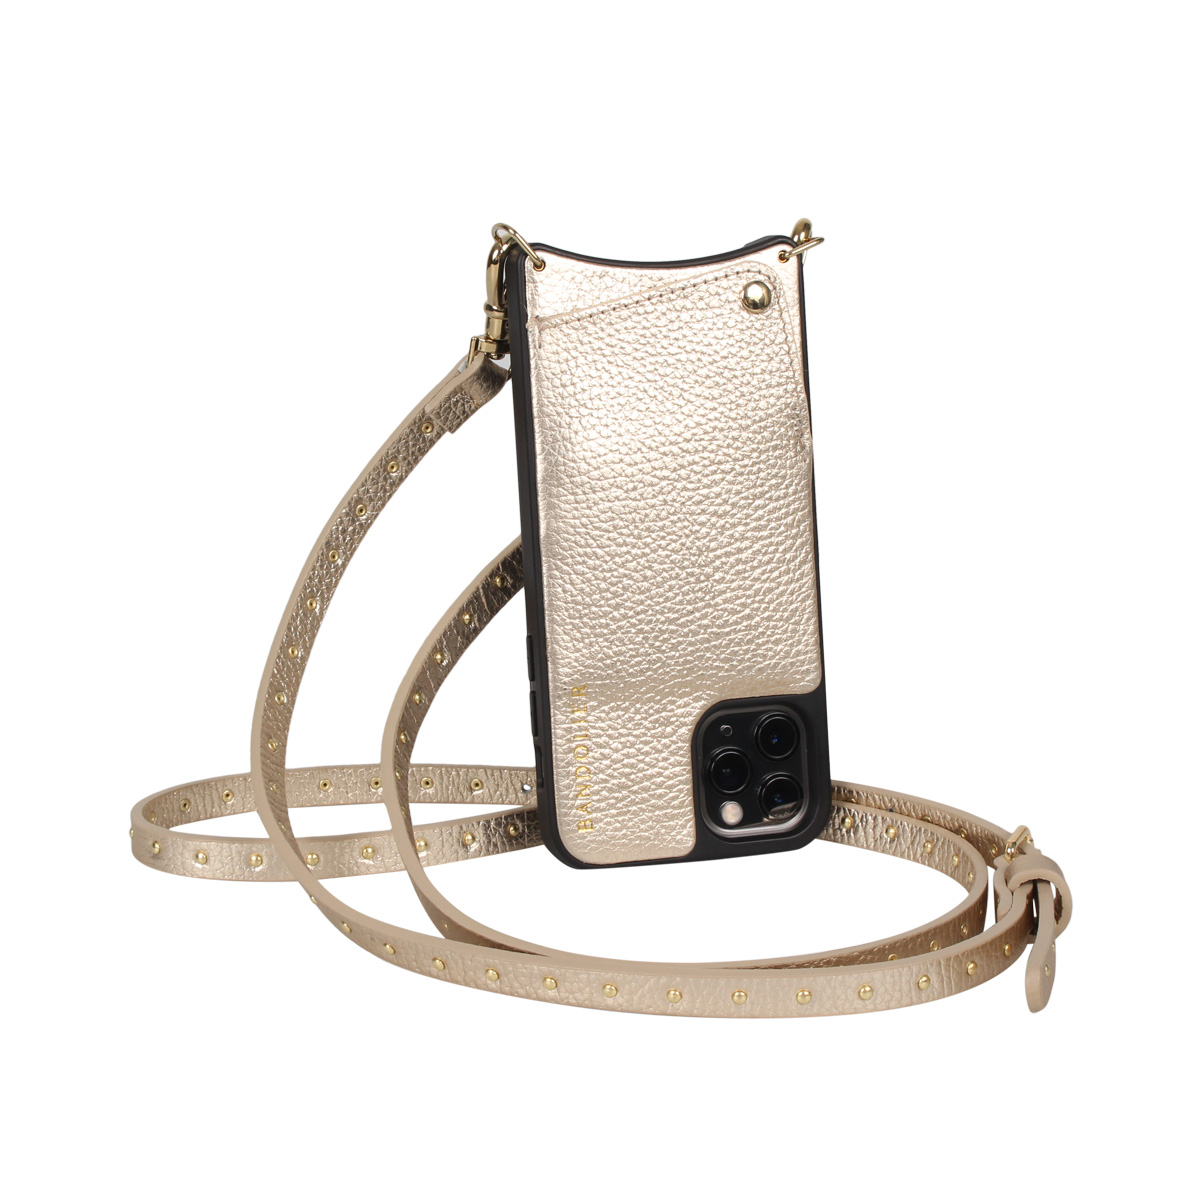 BANDOLIER NICOLE RICH GOLD バンドリヤー iPhone11 ケース スマホ 携帯 ショルダー アイフォン メンズ レディース レザー ゴールド 10NIC